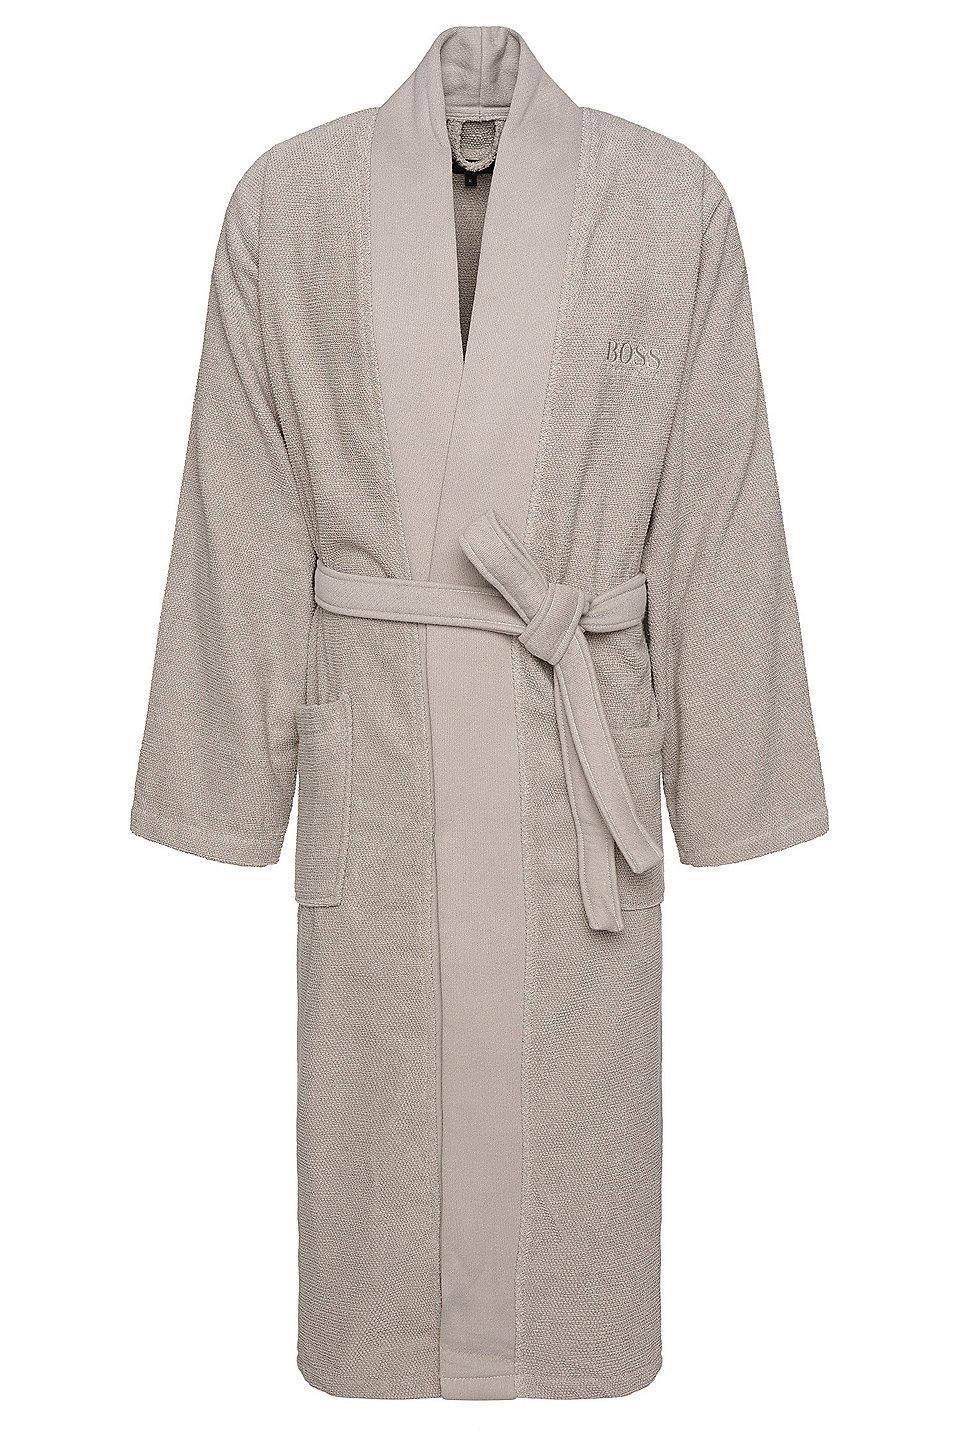 boss bademantel im kimono stil aus gek mmter g ischer. Black Bedroom Furniture Sets. Home Design Ideas